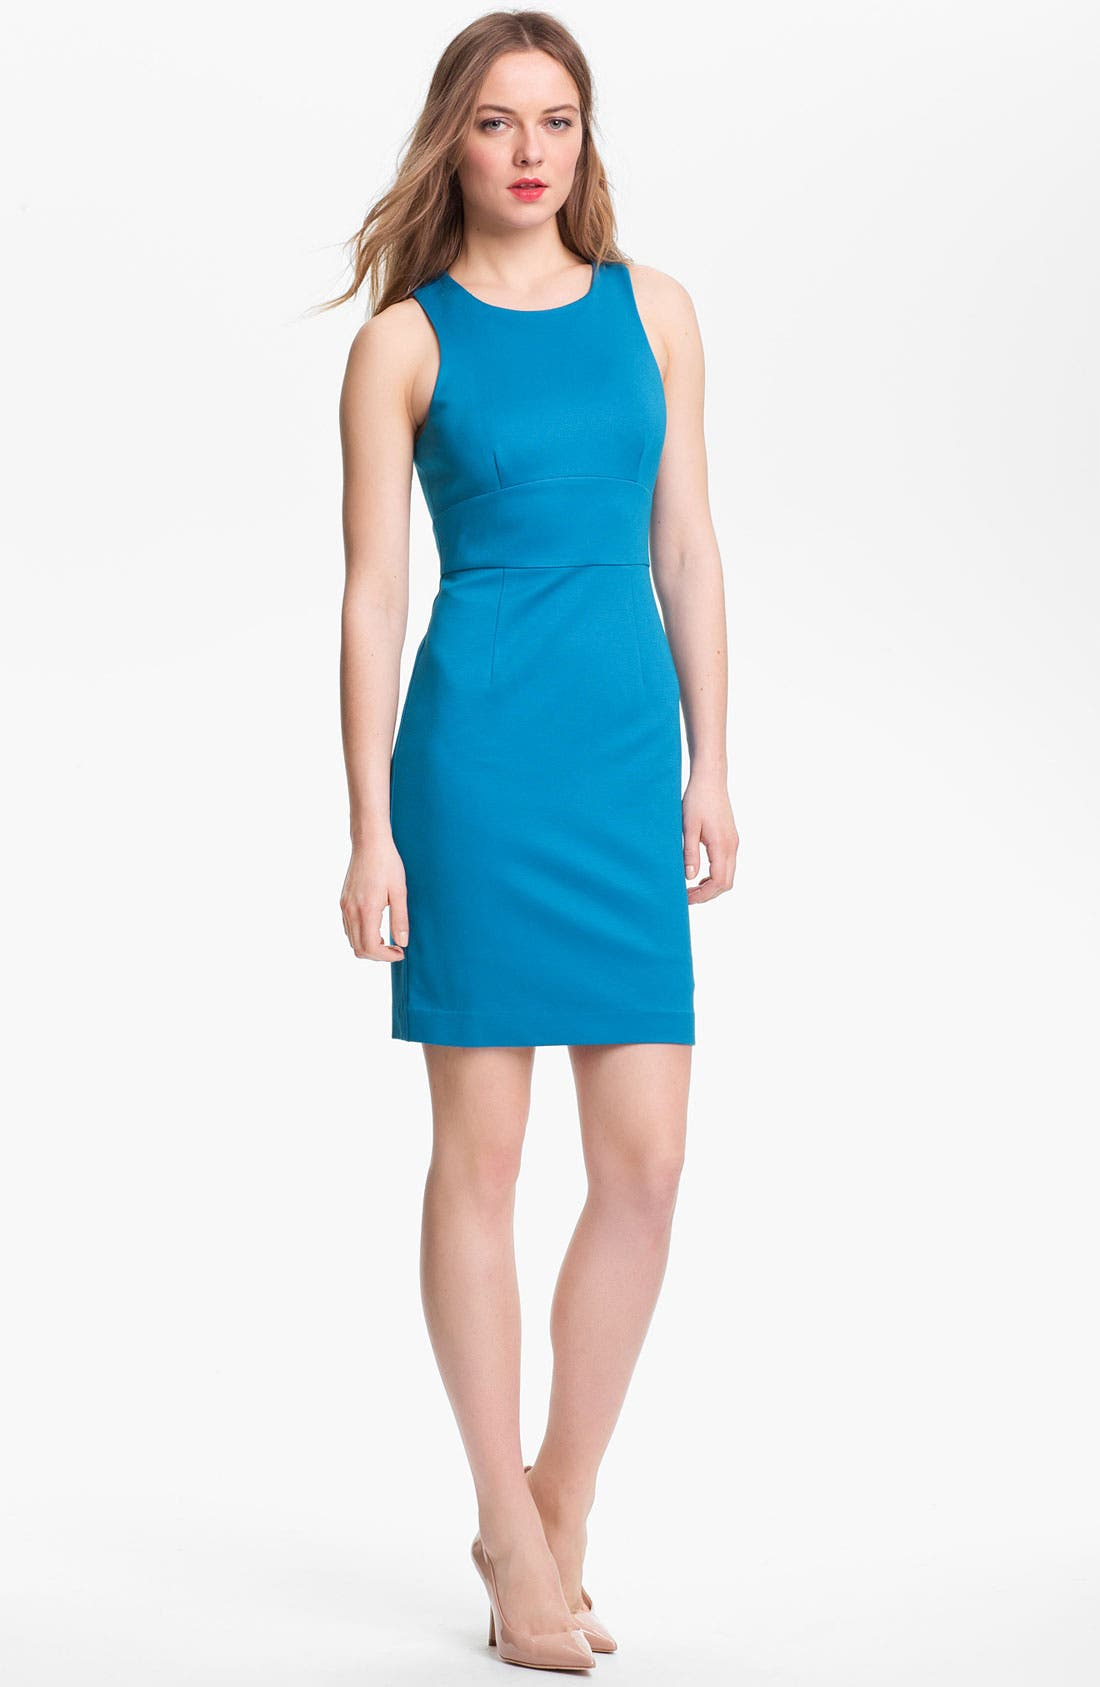 Alternate Image 1 Selected - Trina Turk 'Robyn' Stretch Sheath Dress